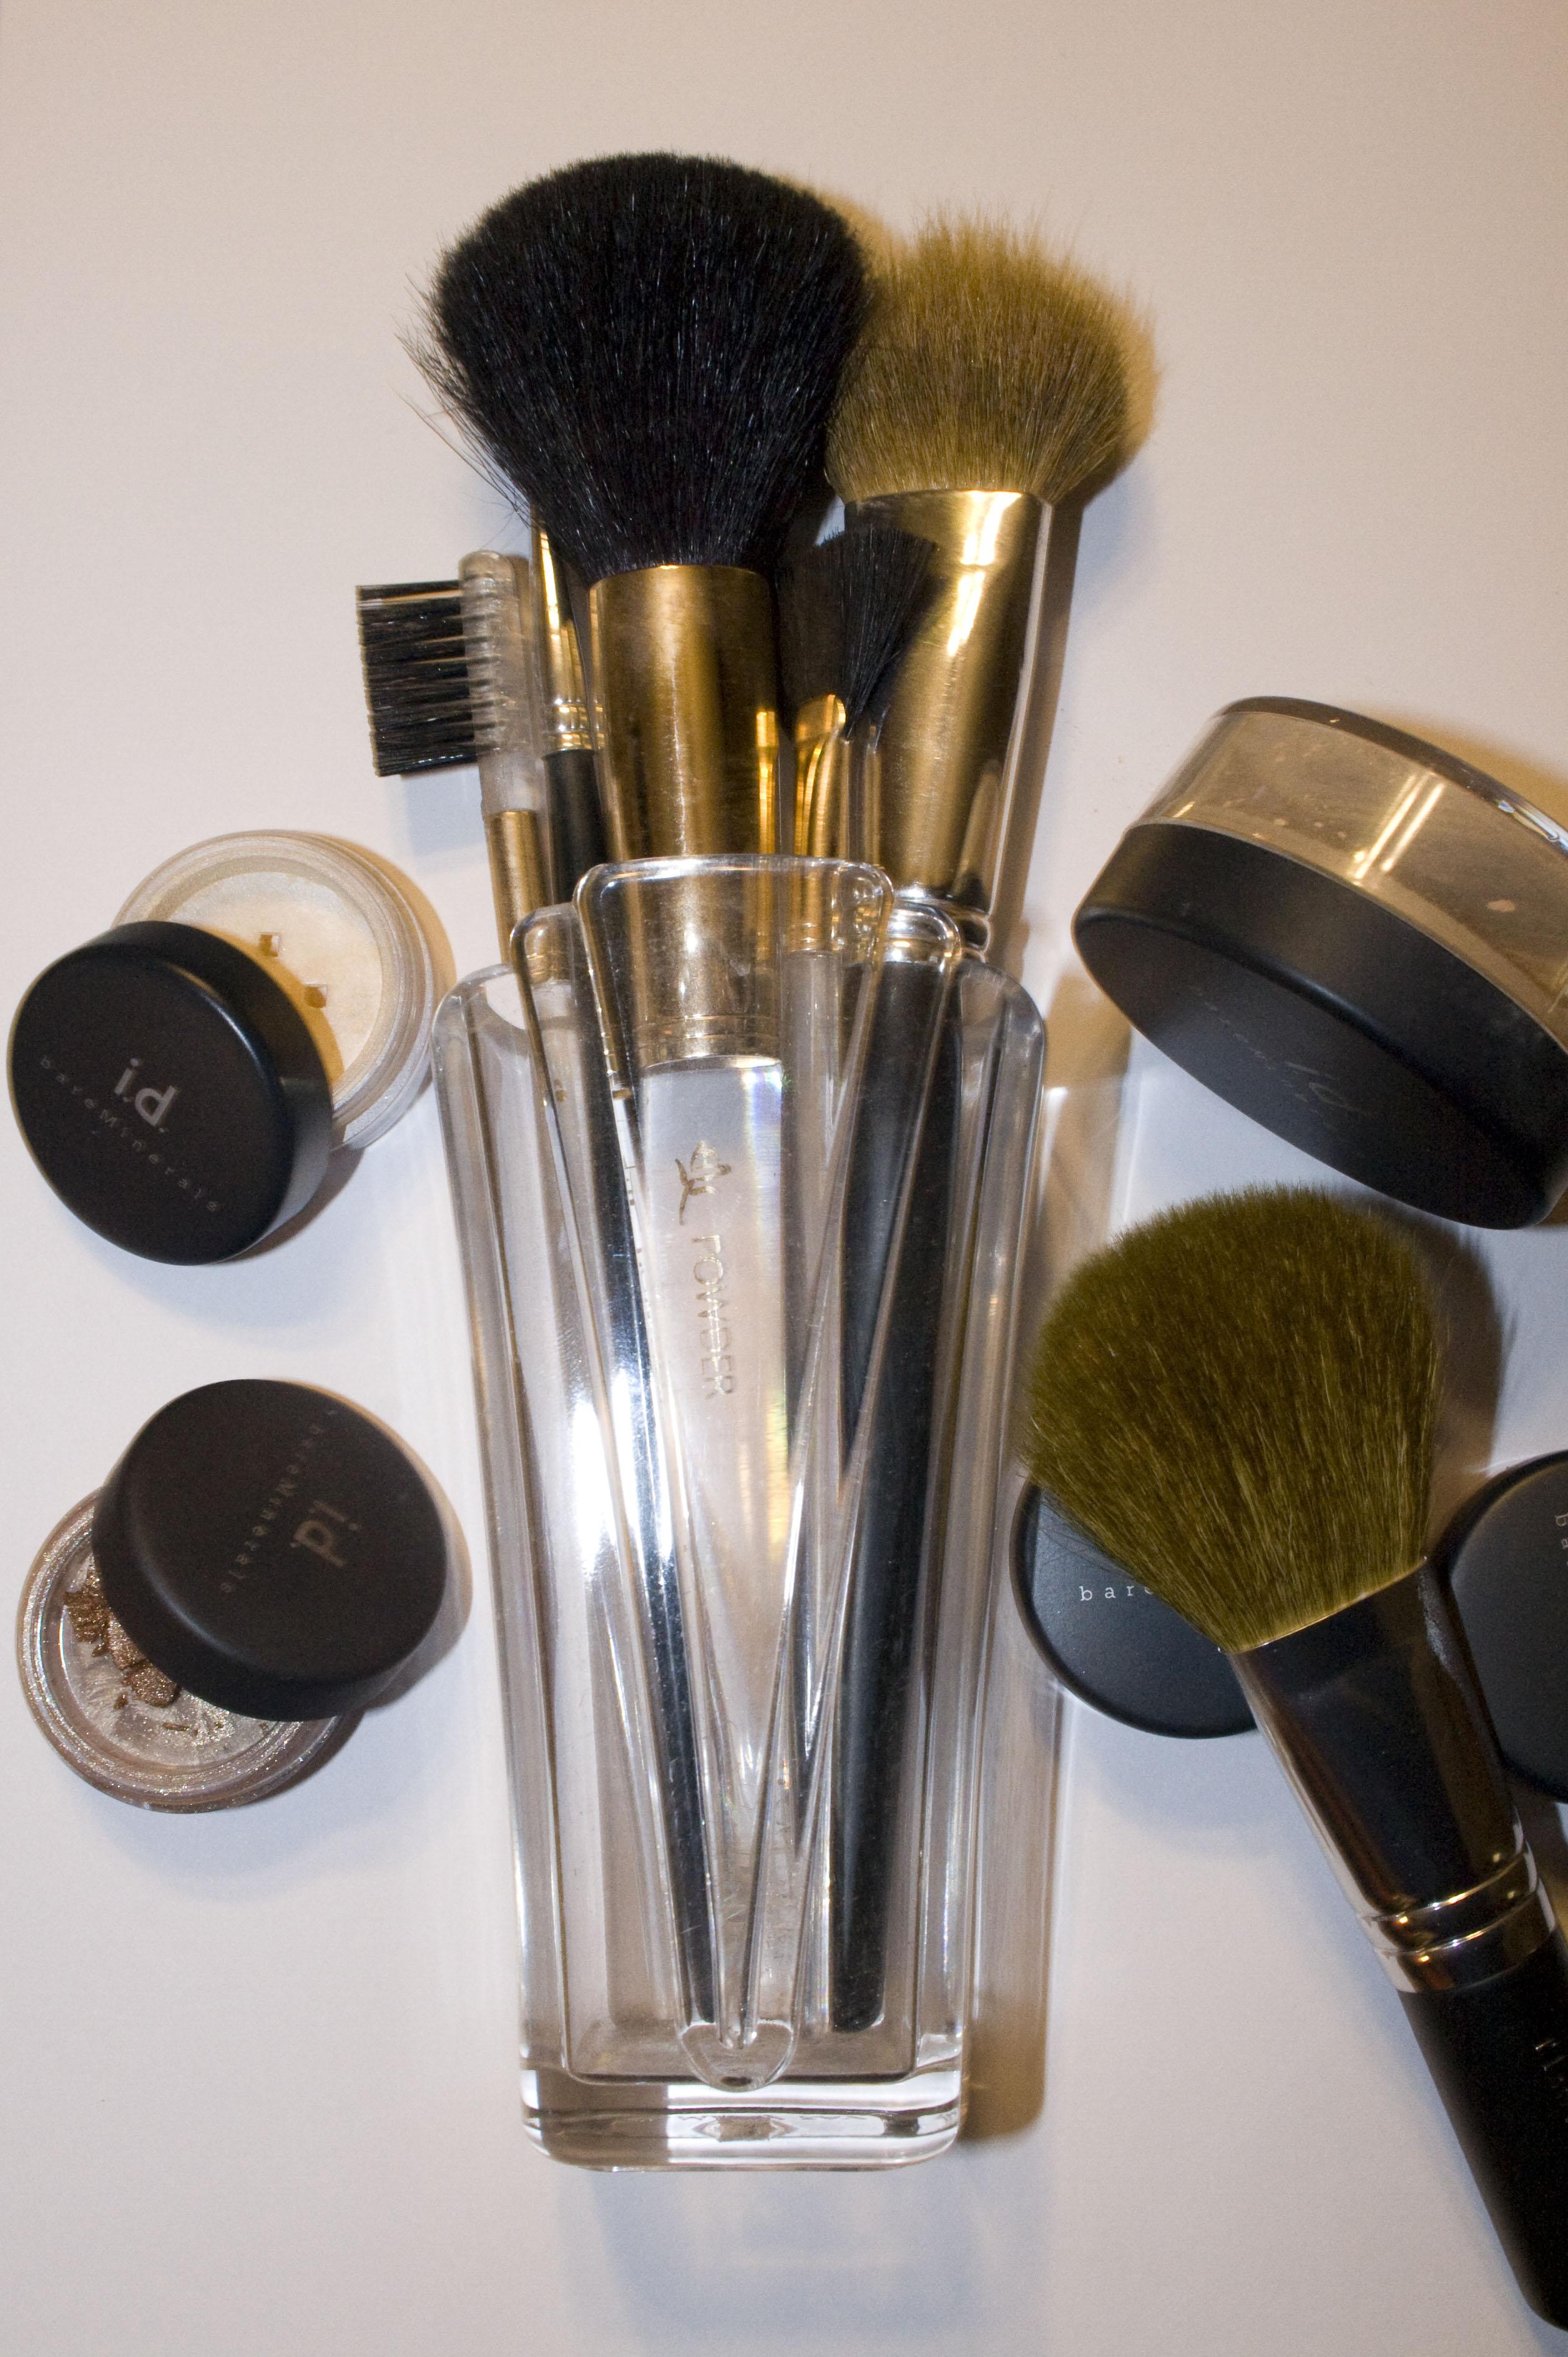 Make-up Equipment, health, Make-up, powder, hair, HQ Photo